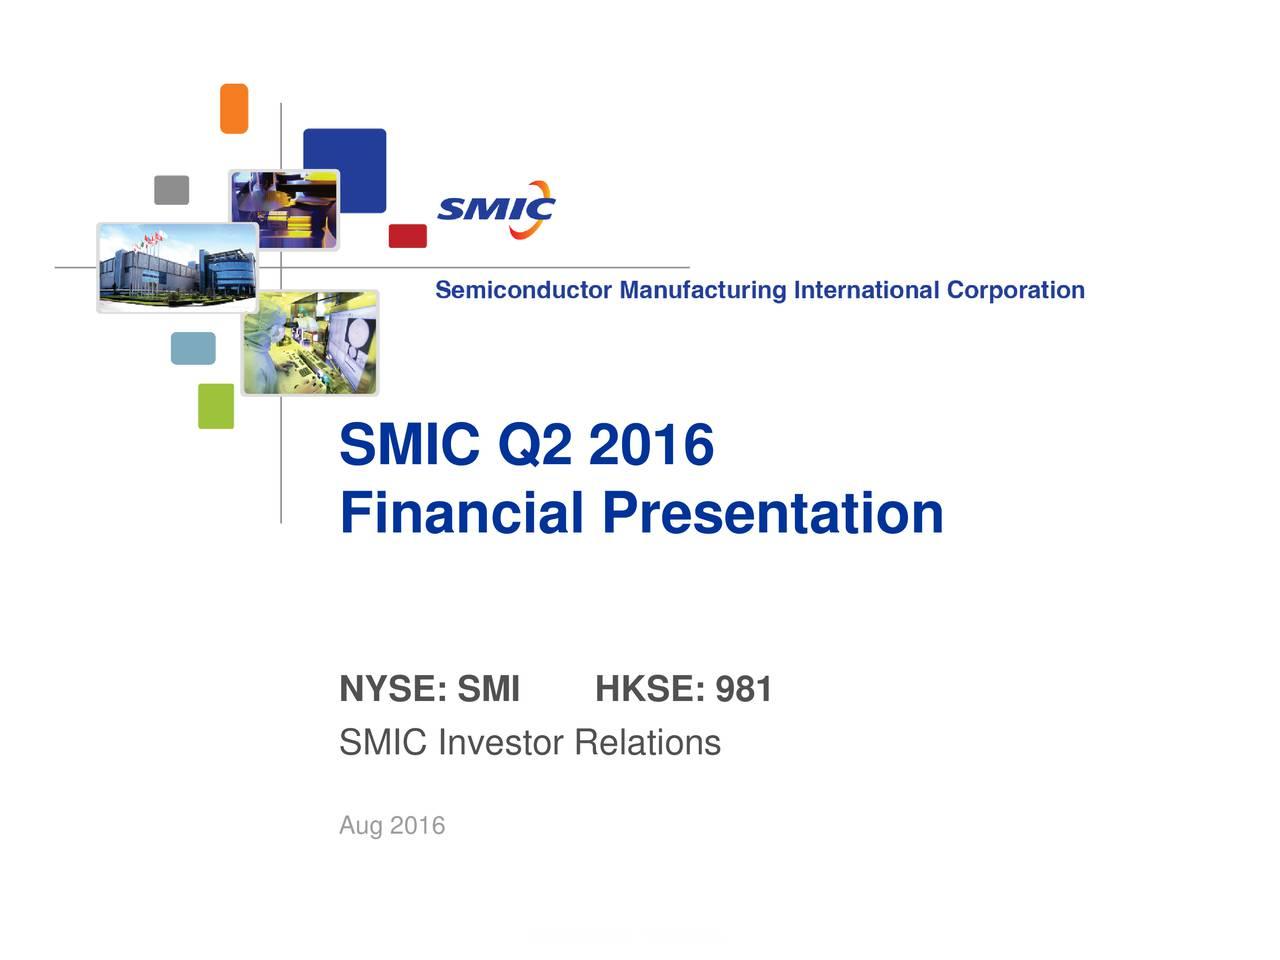 Financial Presentation NYSE: SMI HKSE: 981 SMIC Investor Relations Aug 2016